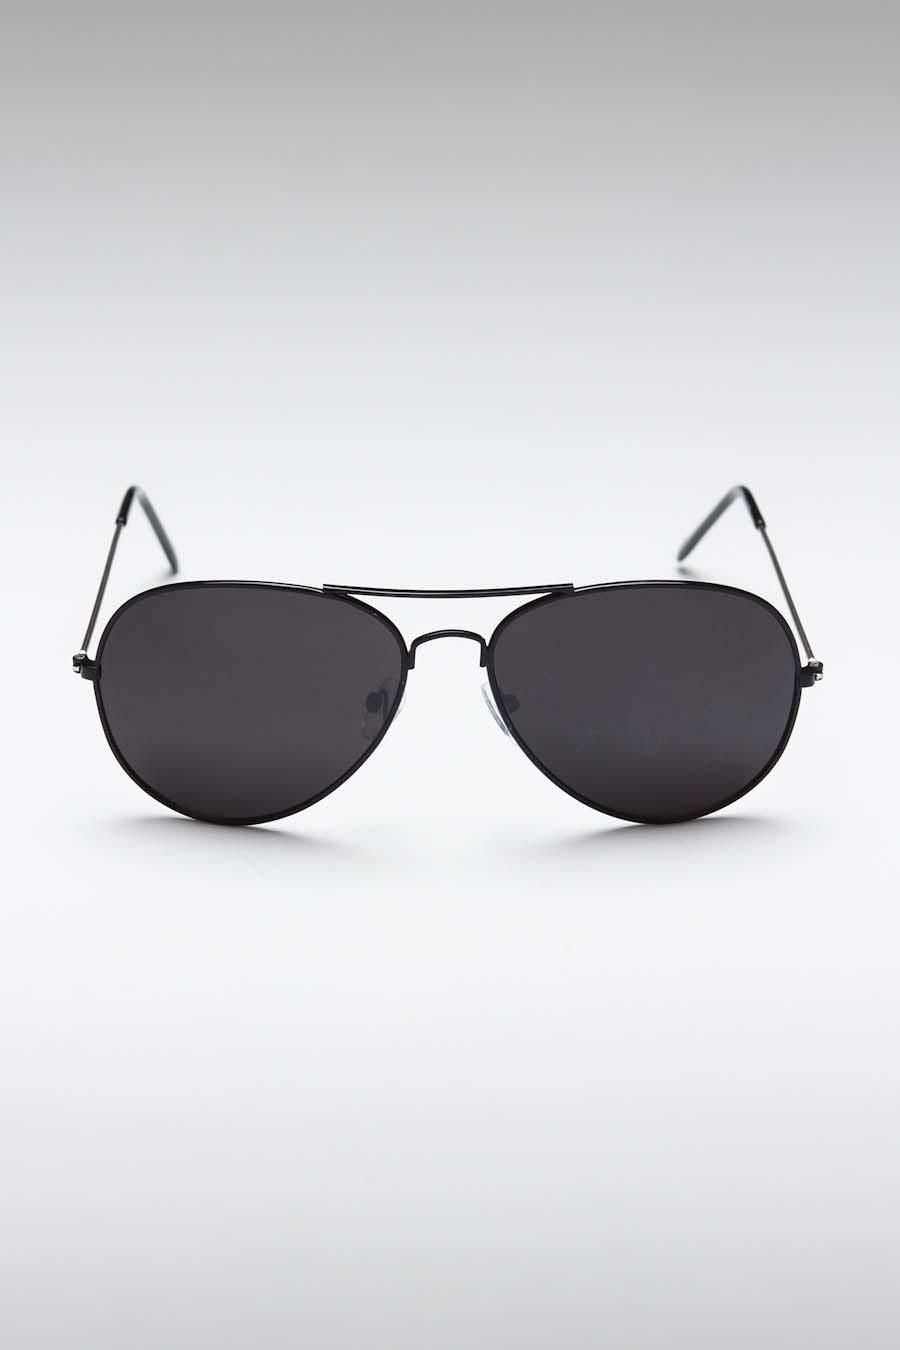 3d6b38cc9b7 Ray-Ban Original Aviator Polarized Sunglasses---- Only the best.  VonMaur